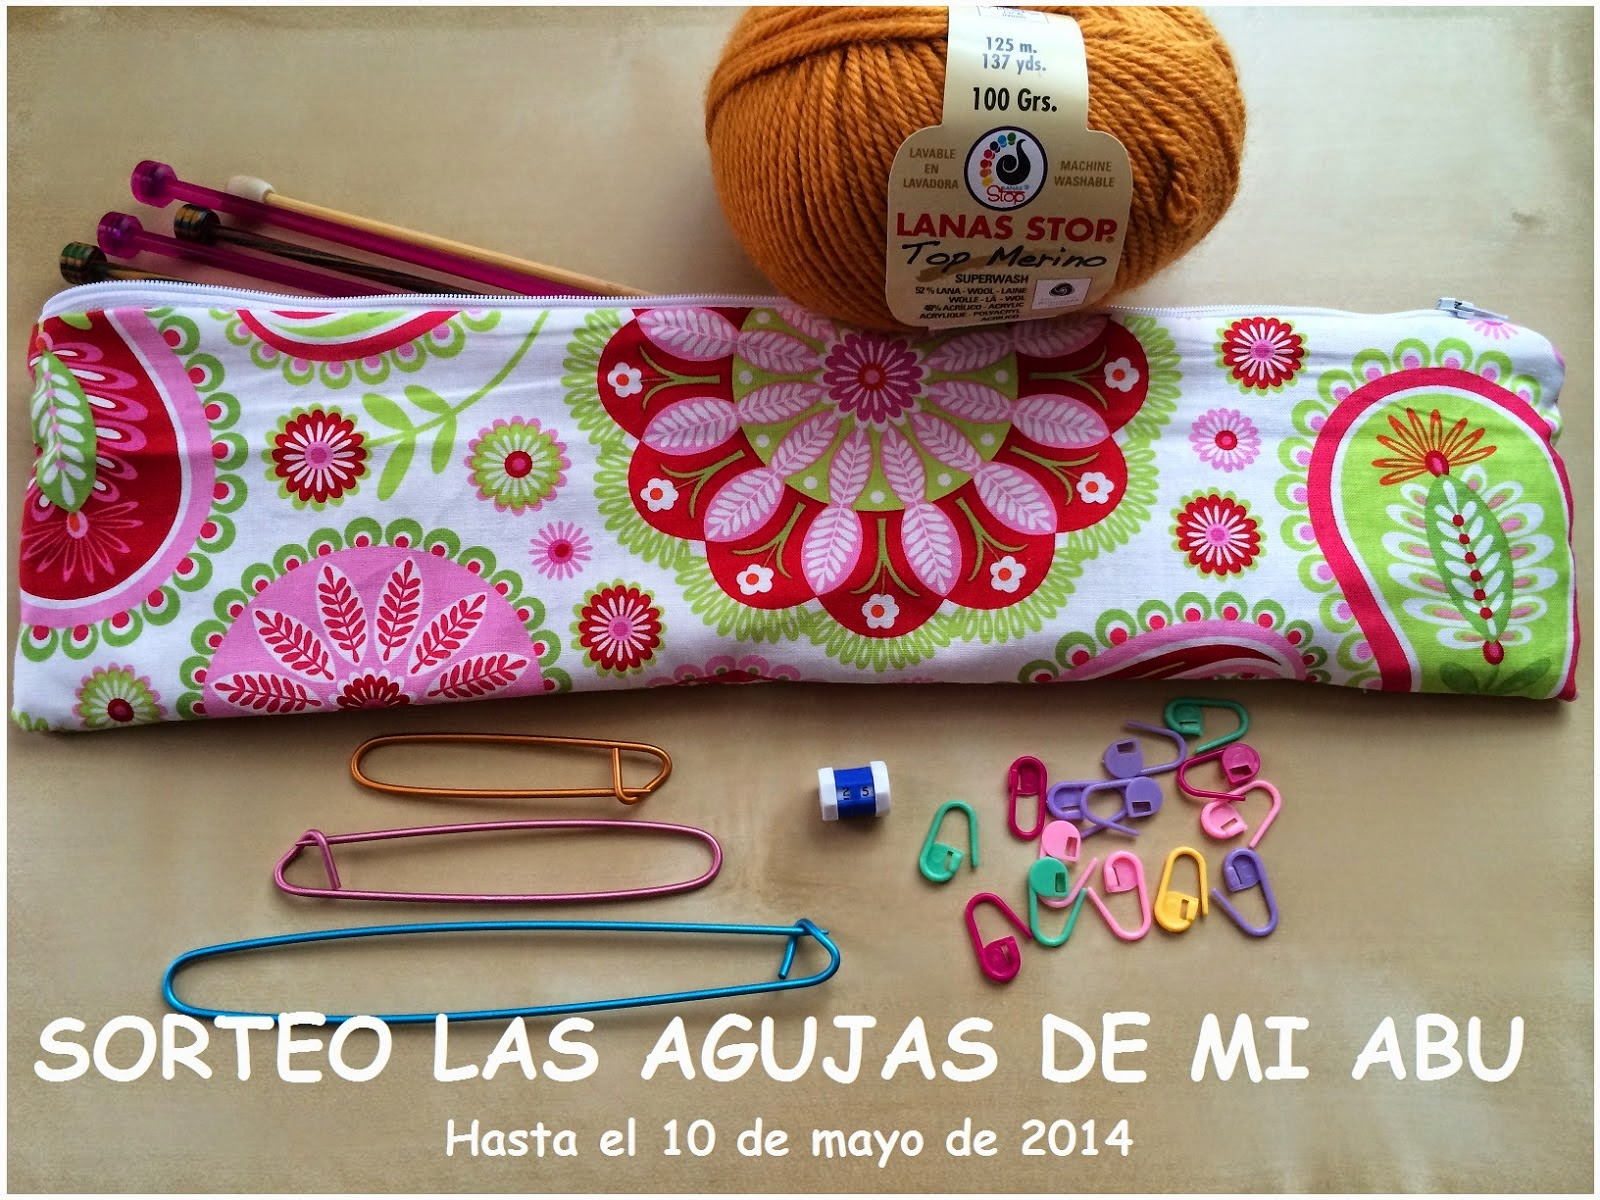 http://lasagujasdemiabu.blogspot.com.es/